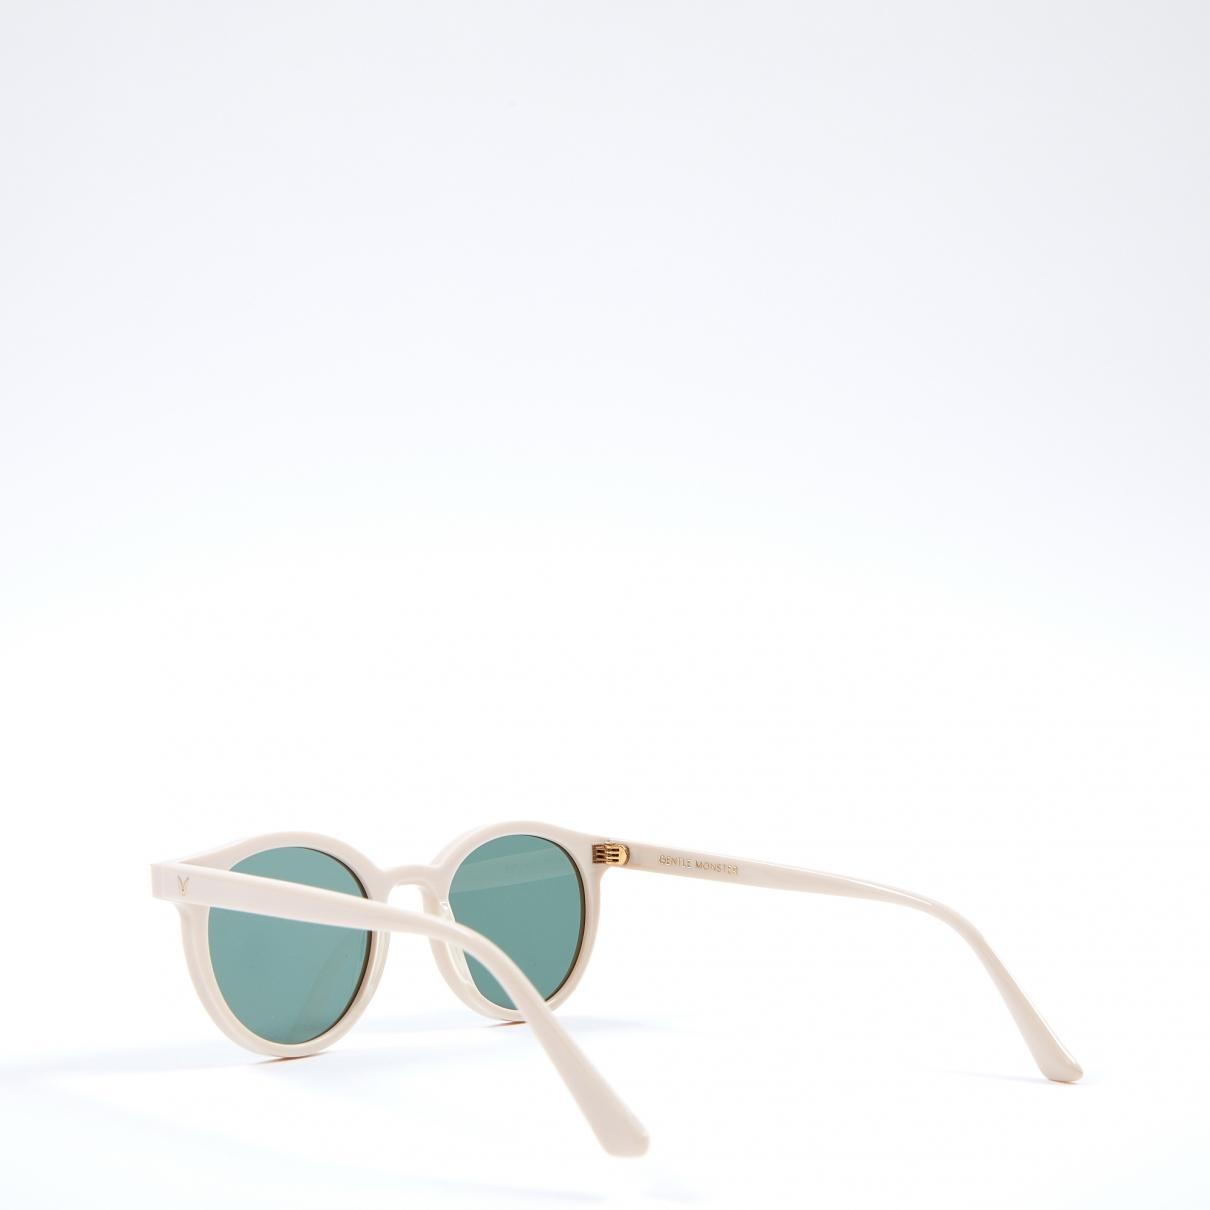 c1ffe5f39d3e Lyst - Gentle Monster Pre-owned Ecru Plastic Sunglasses